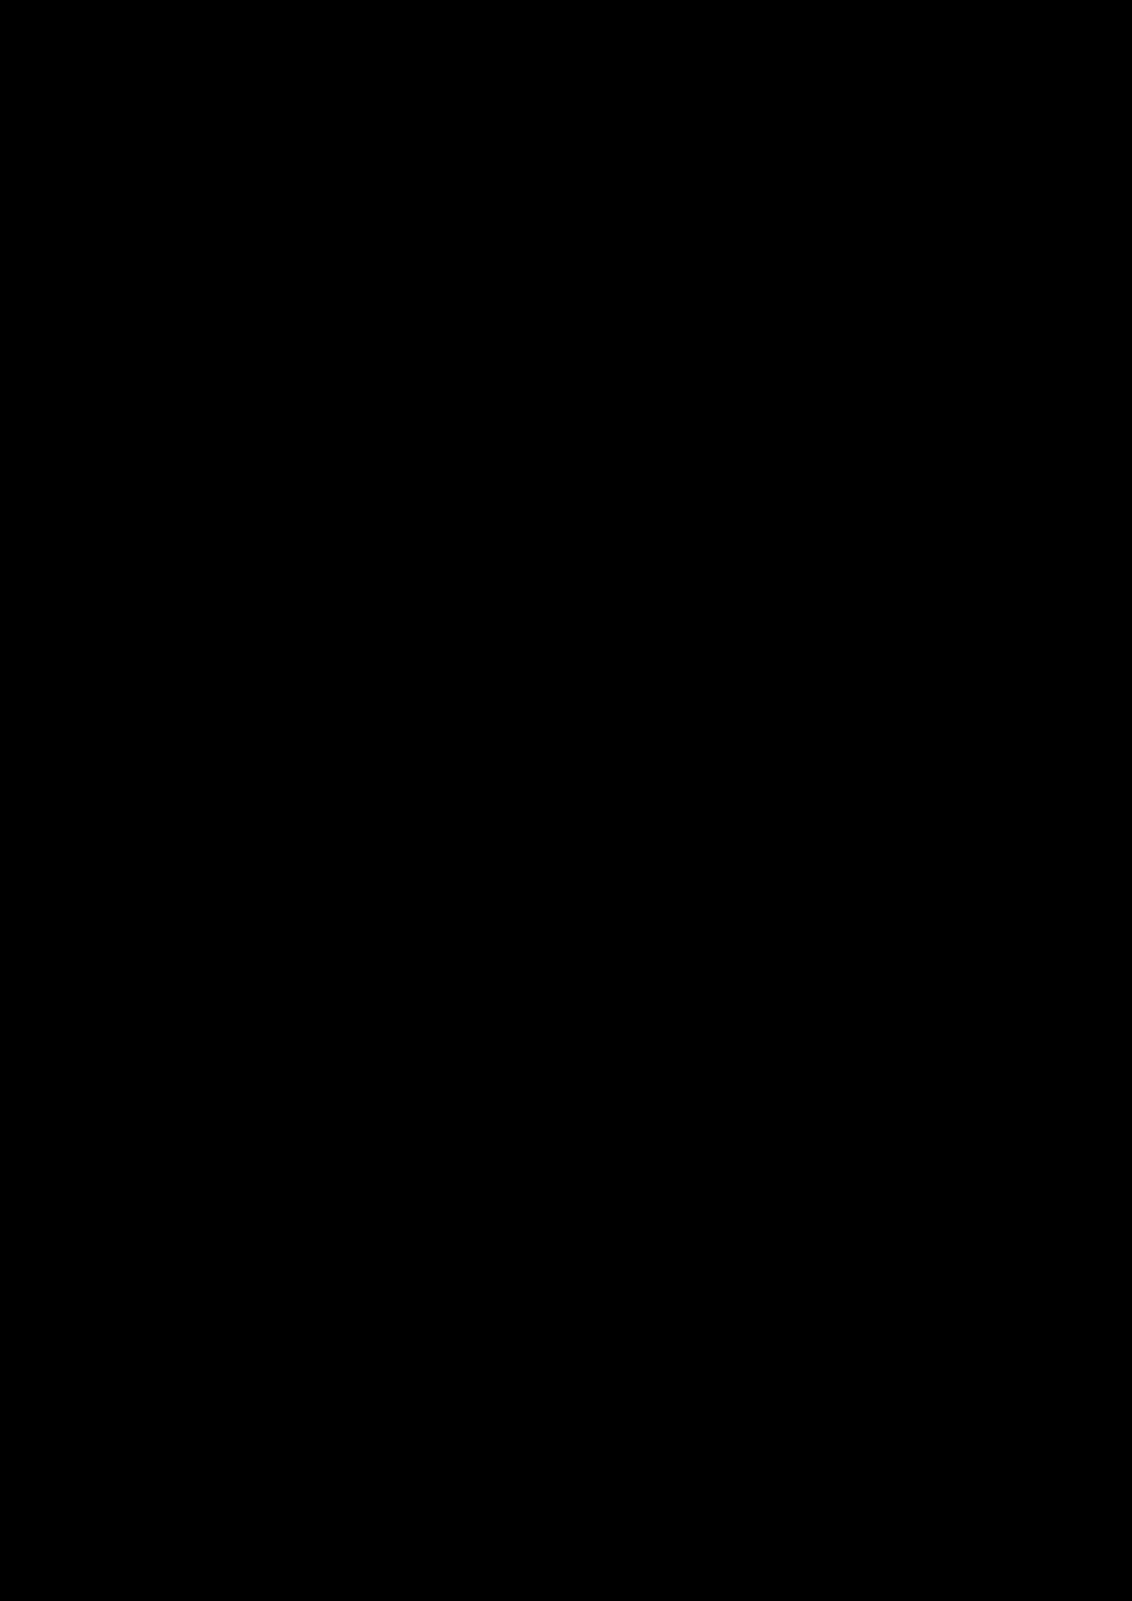 Korolevstvo slez slide, Image 67